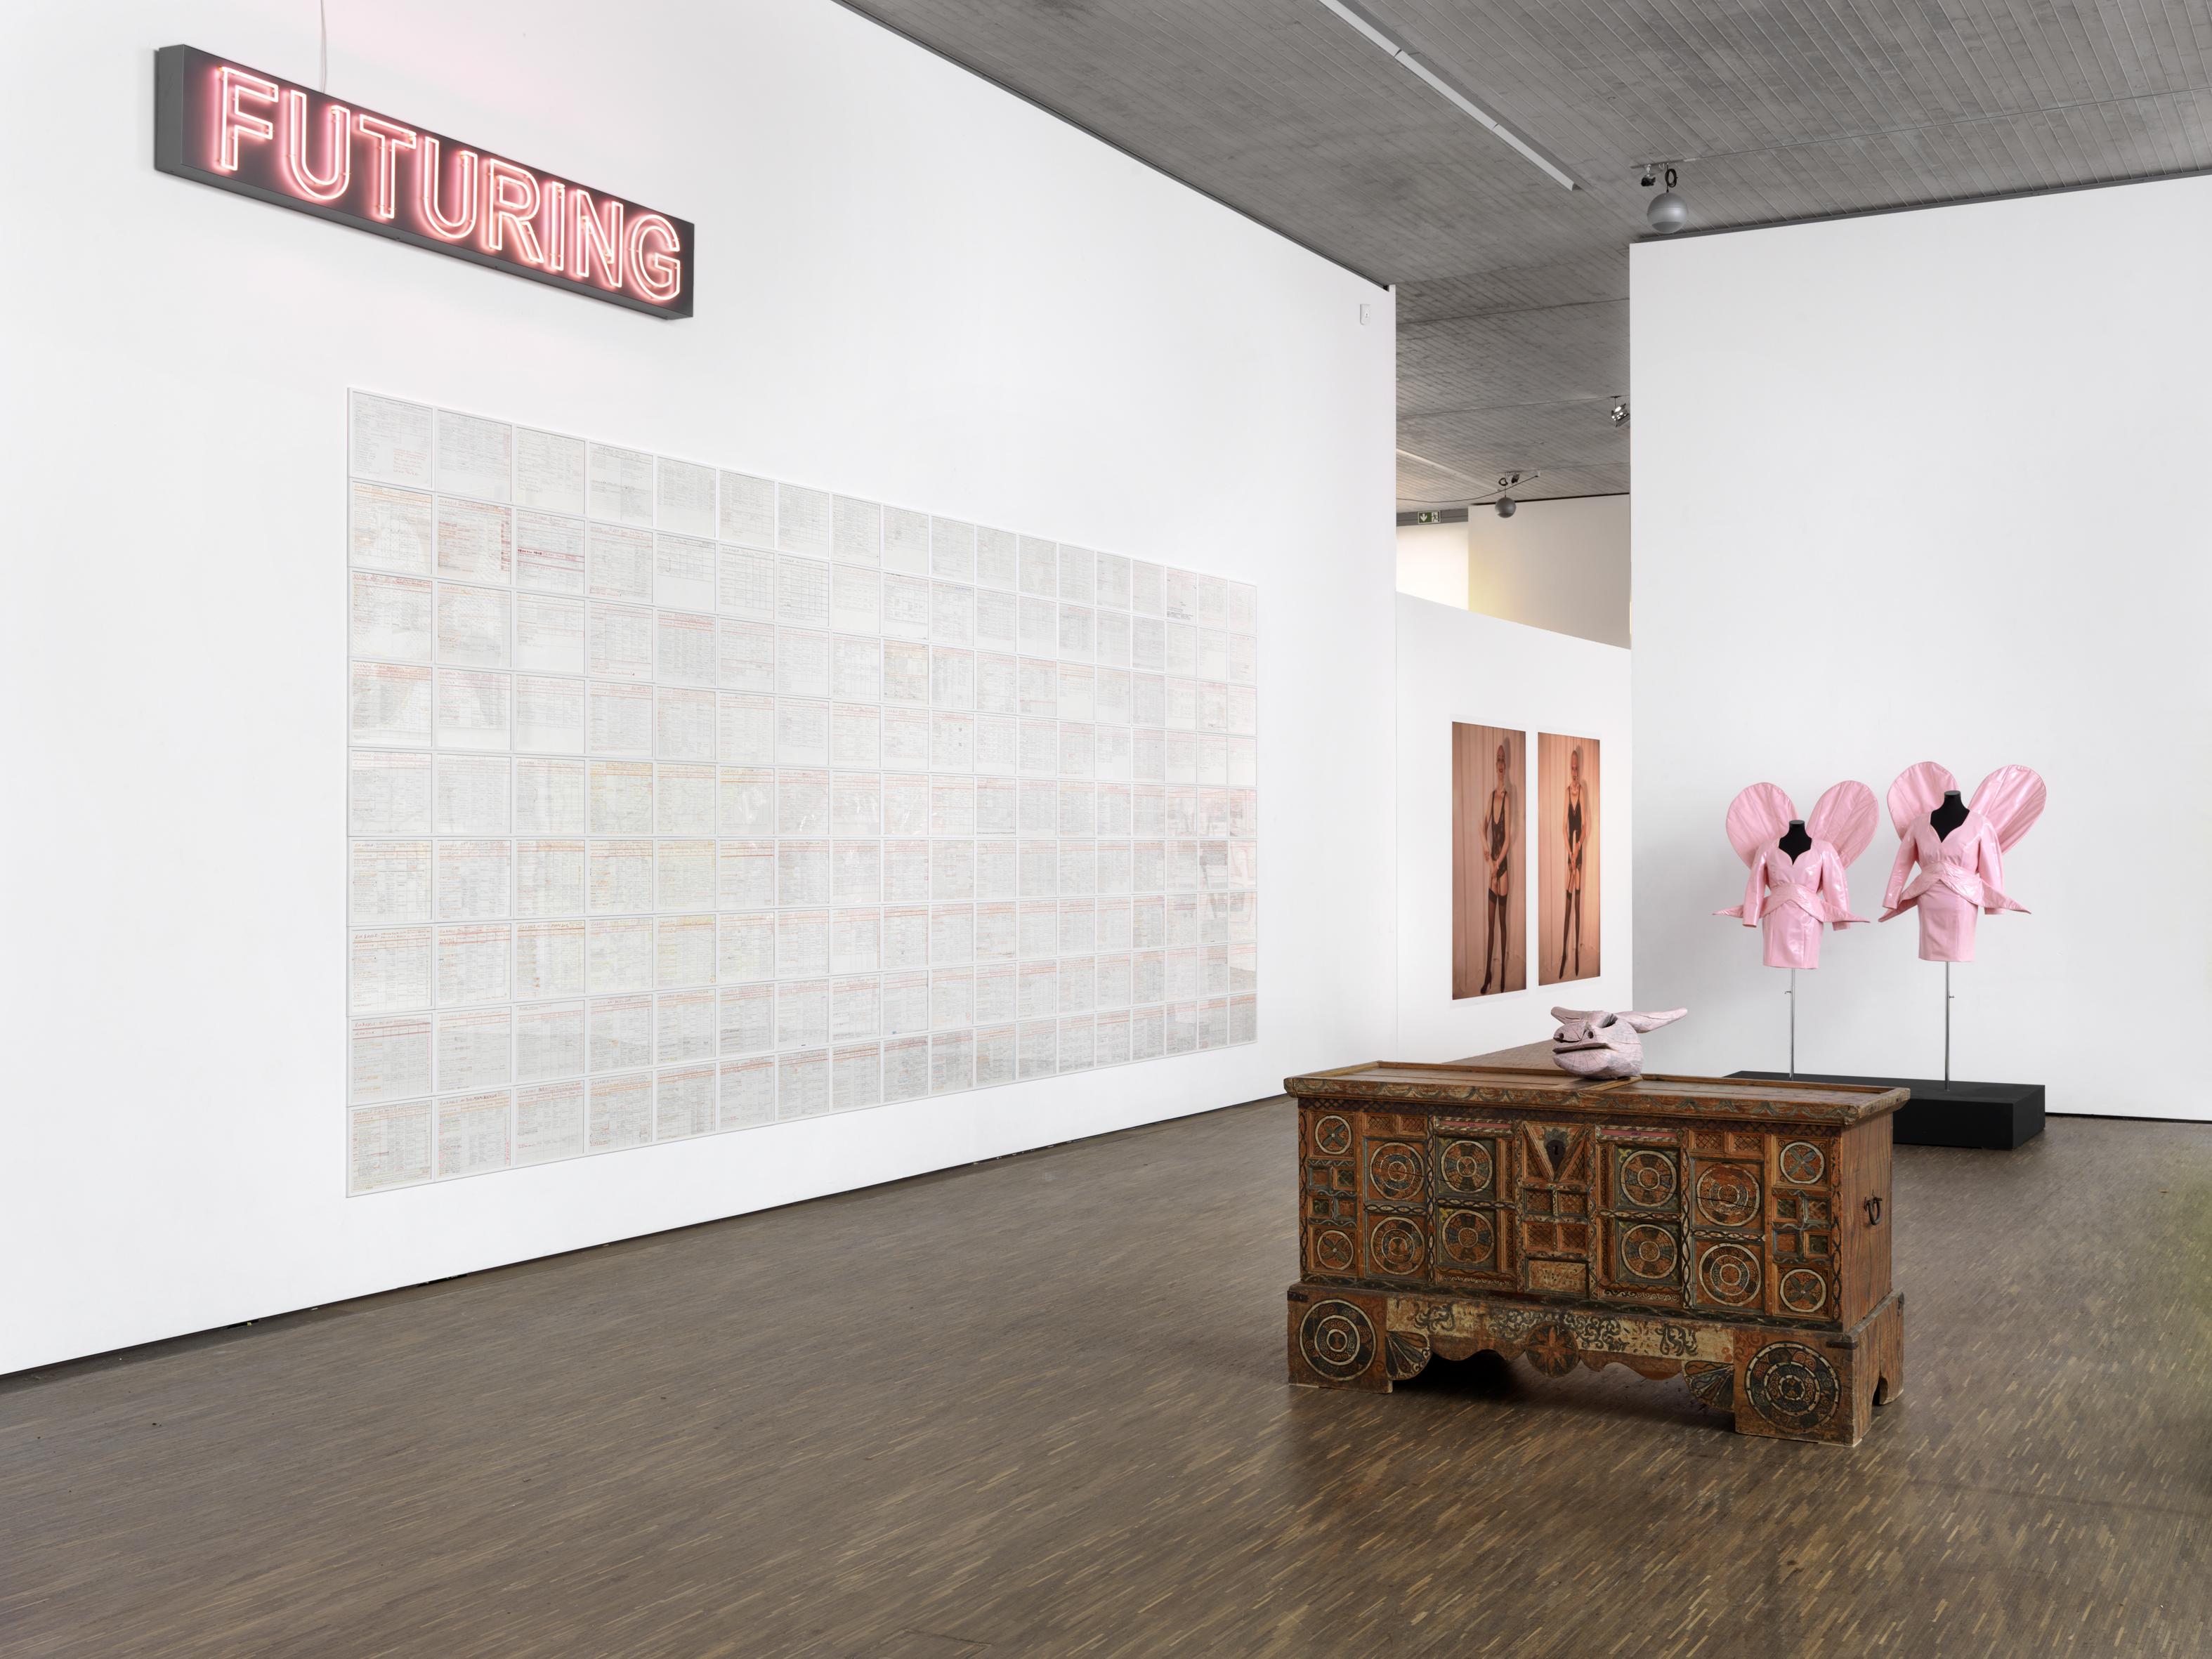 Eva und Adele - l'amour du risque, Installationsansicht, 2018, (c) me Collecotrs Room Berlin, Photo Bernd Borchardt